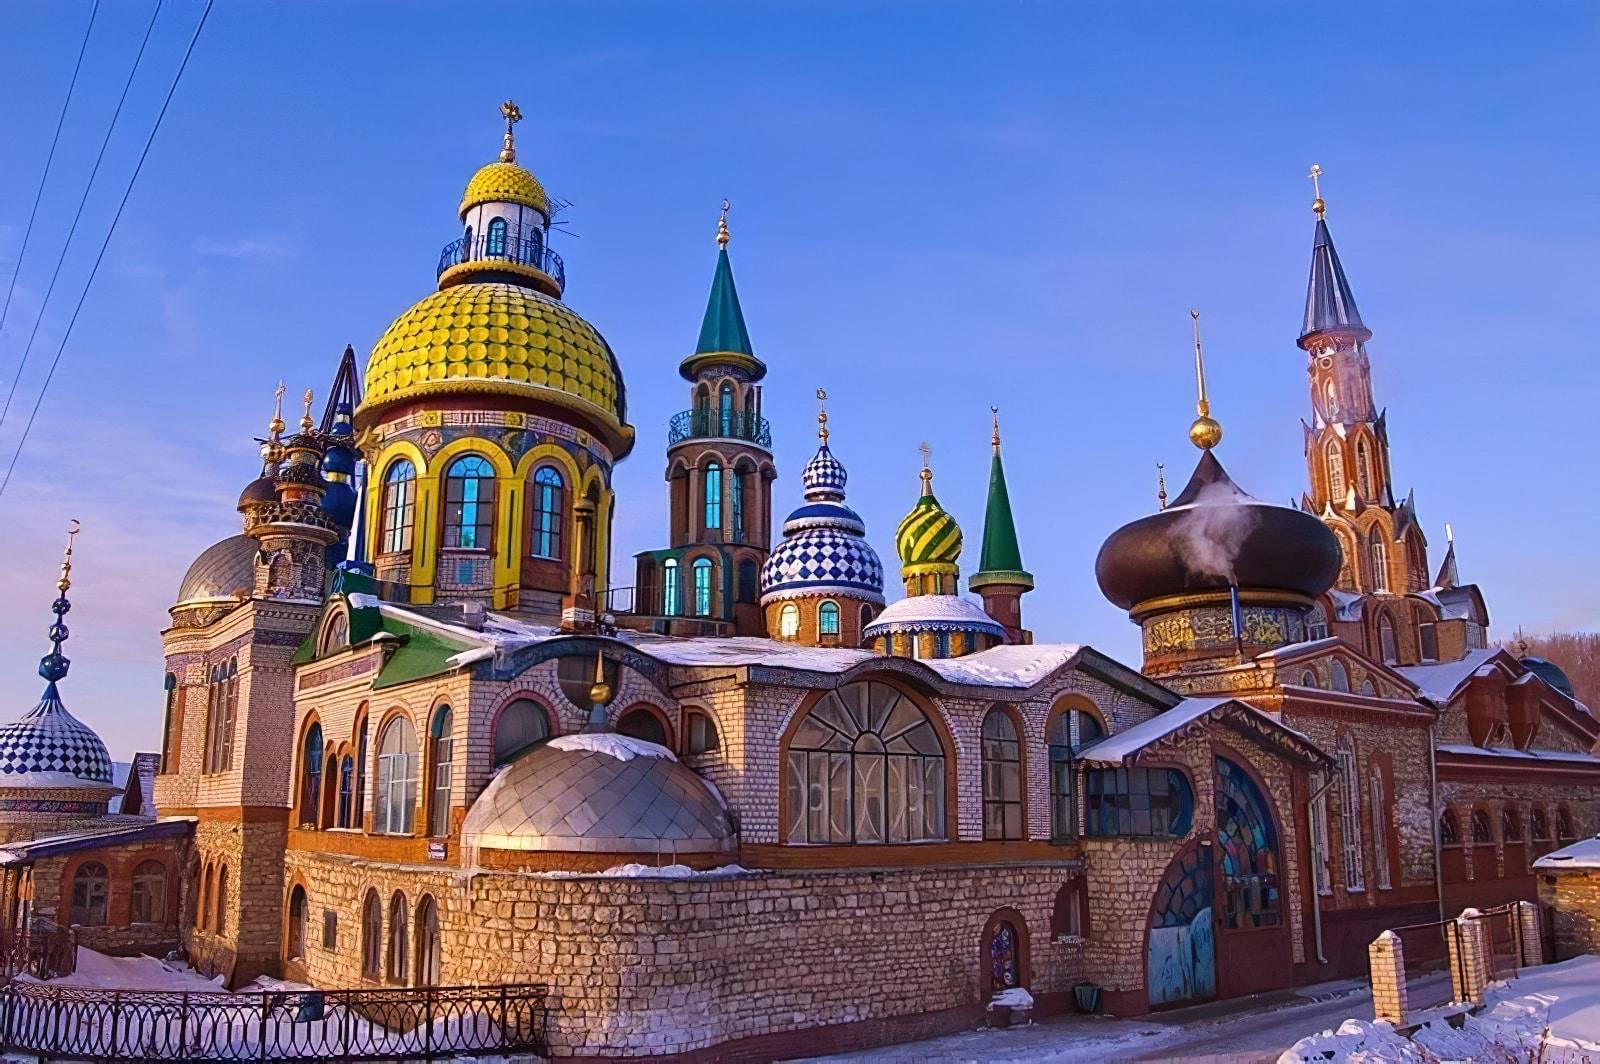 Temple de toutes les religions, Kazan, Ildar Khanov